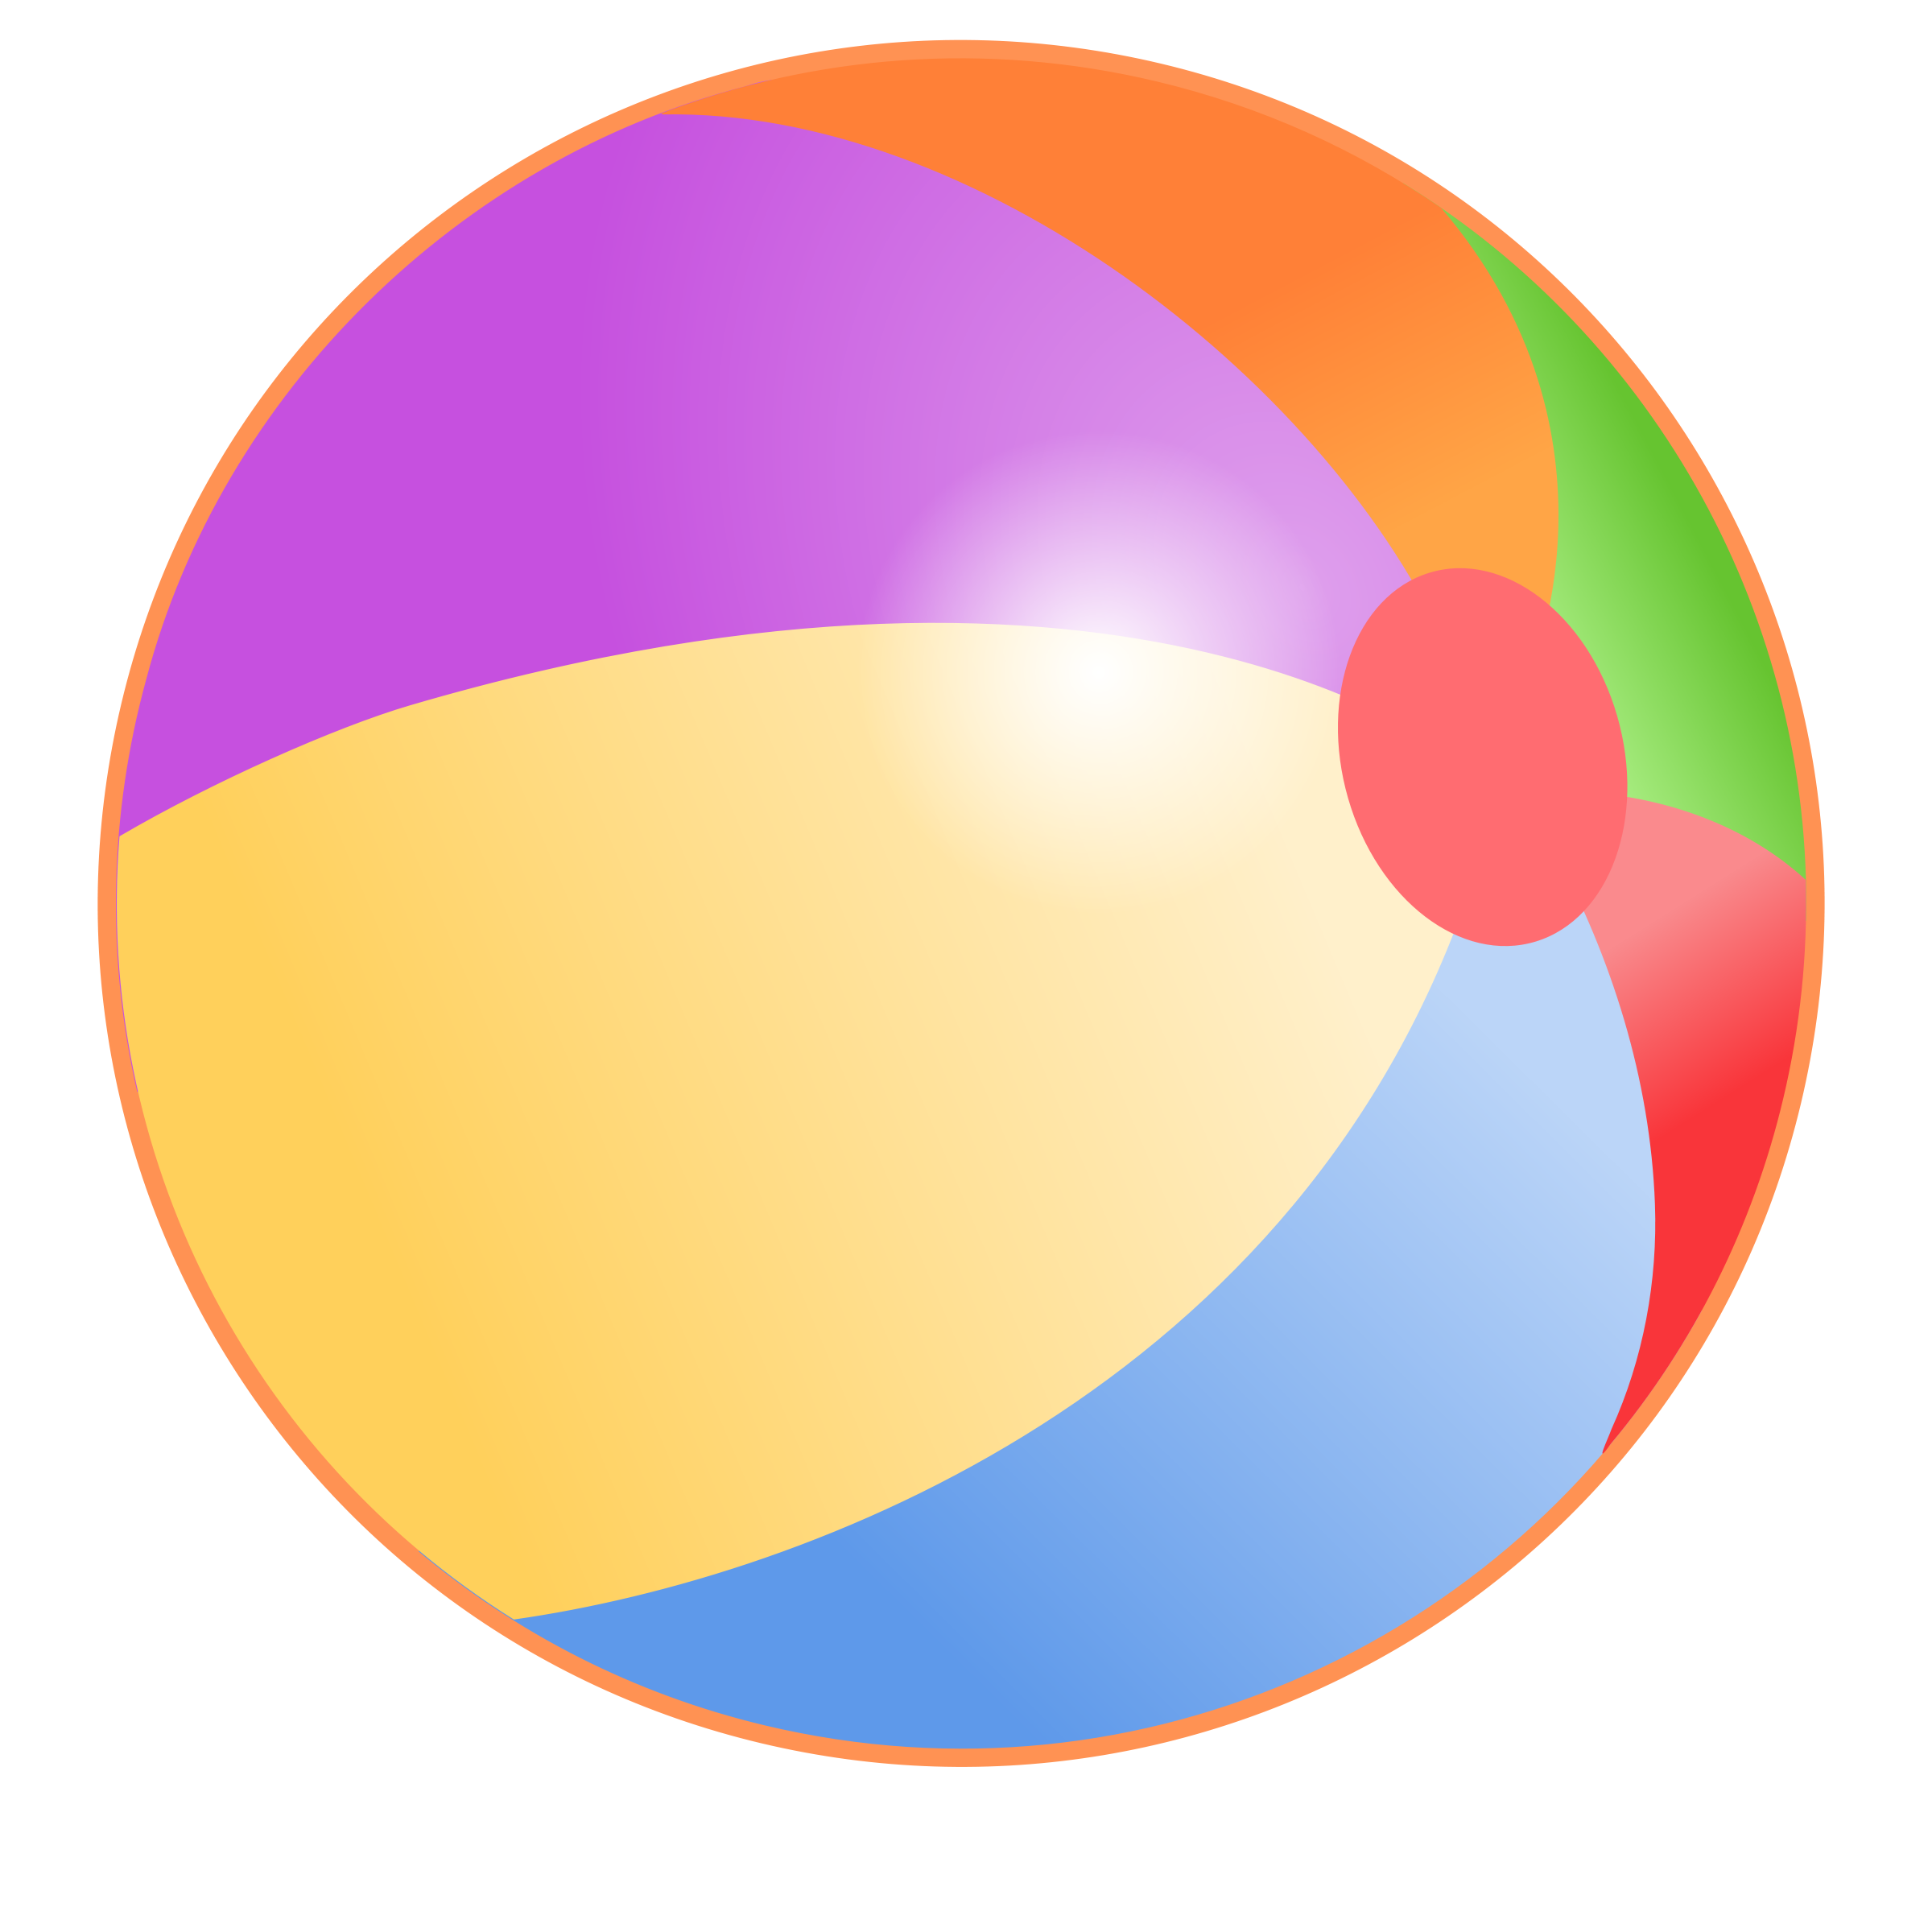 beach ball image - HD2400×2400